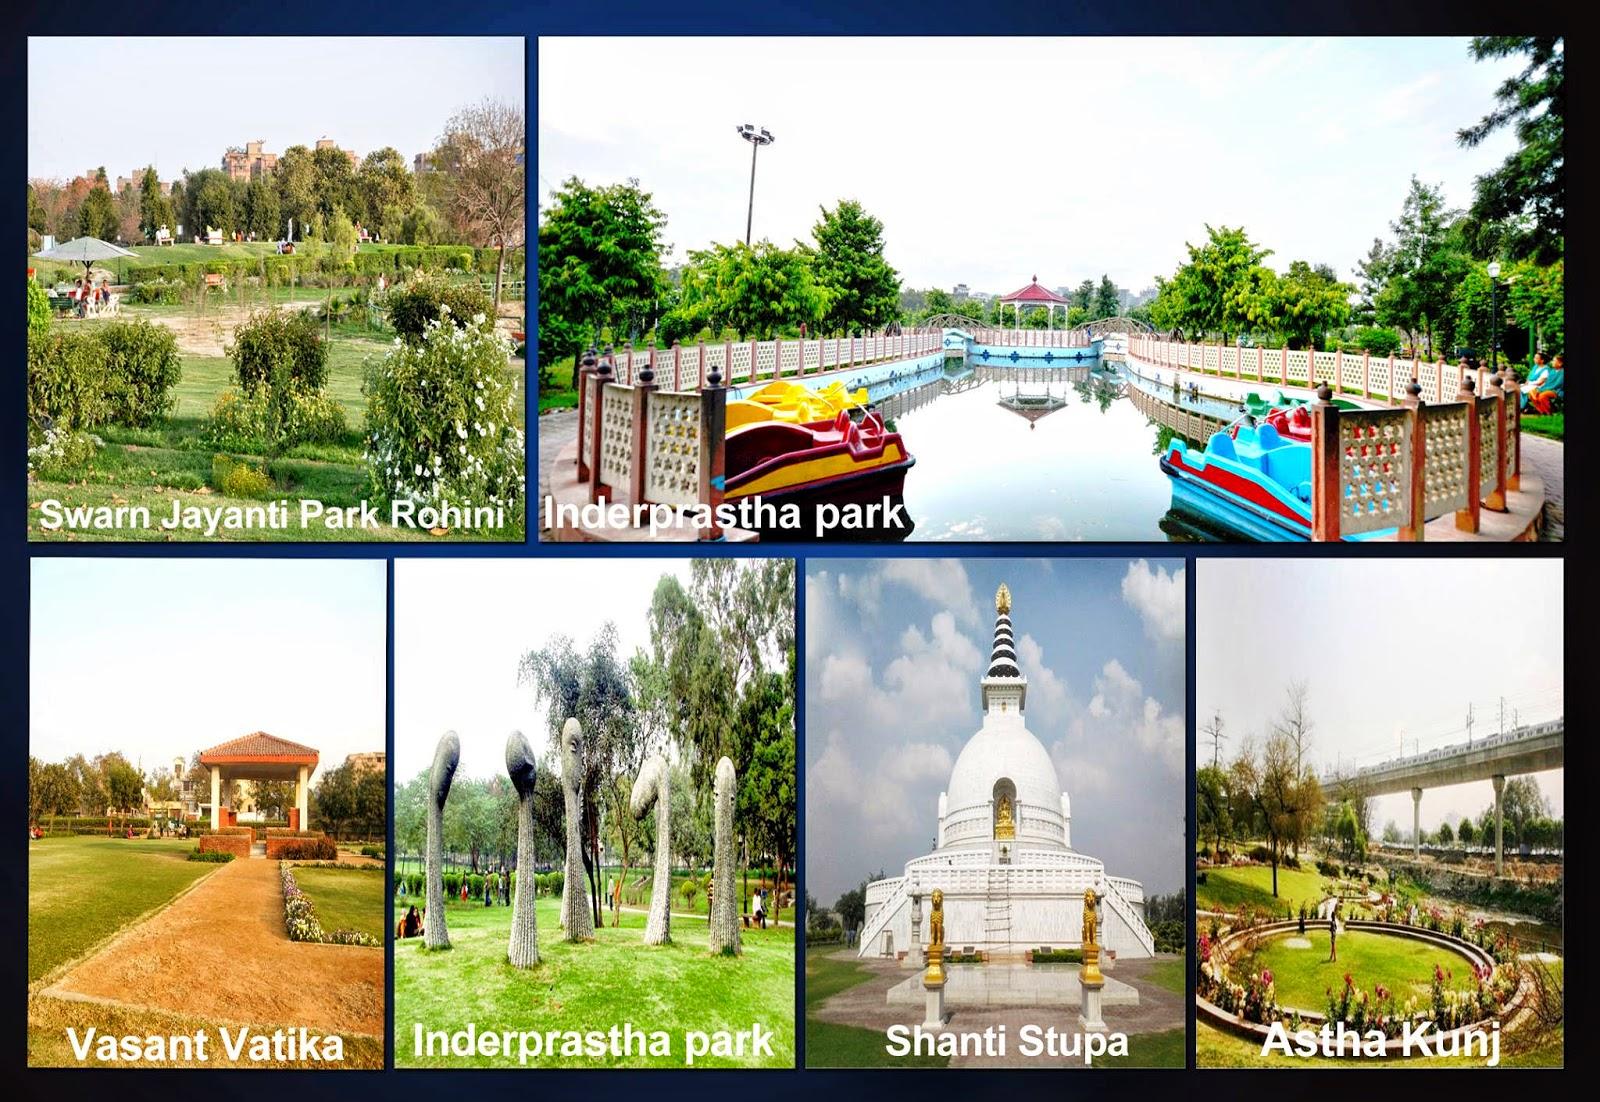 swawrn jayanti park and aastha kunj